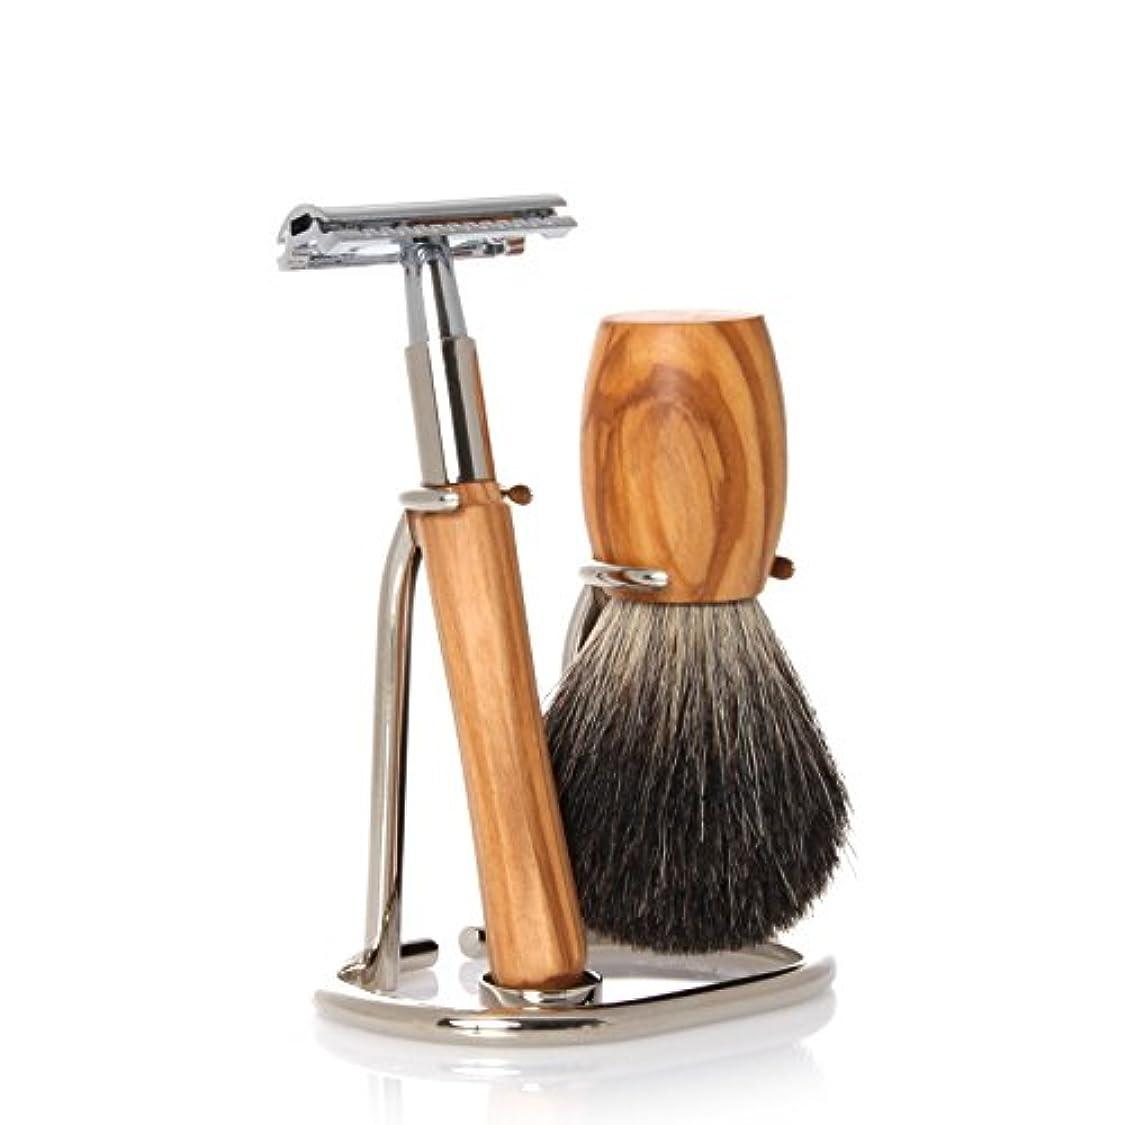 GOLDDACHS Shaving Set, Safety razor, 100% badger hair, olive wood